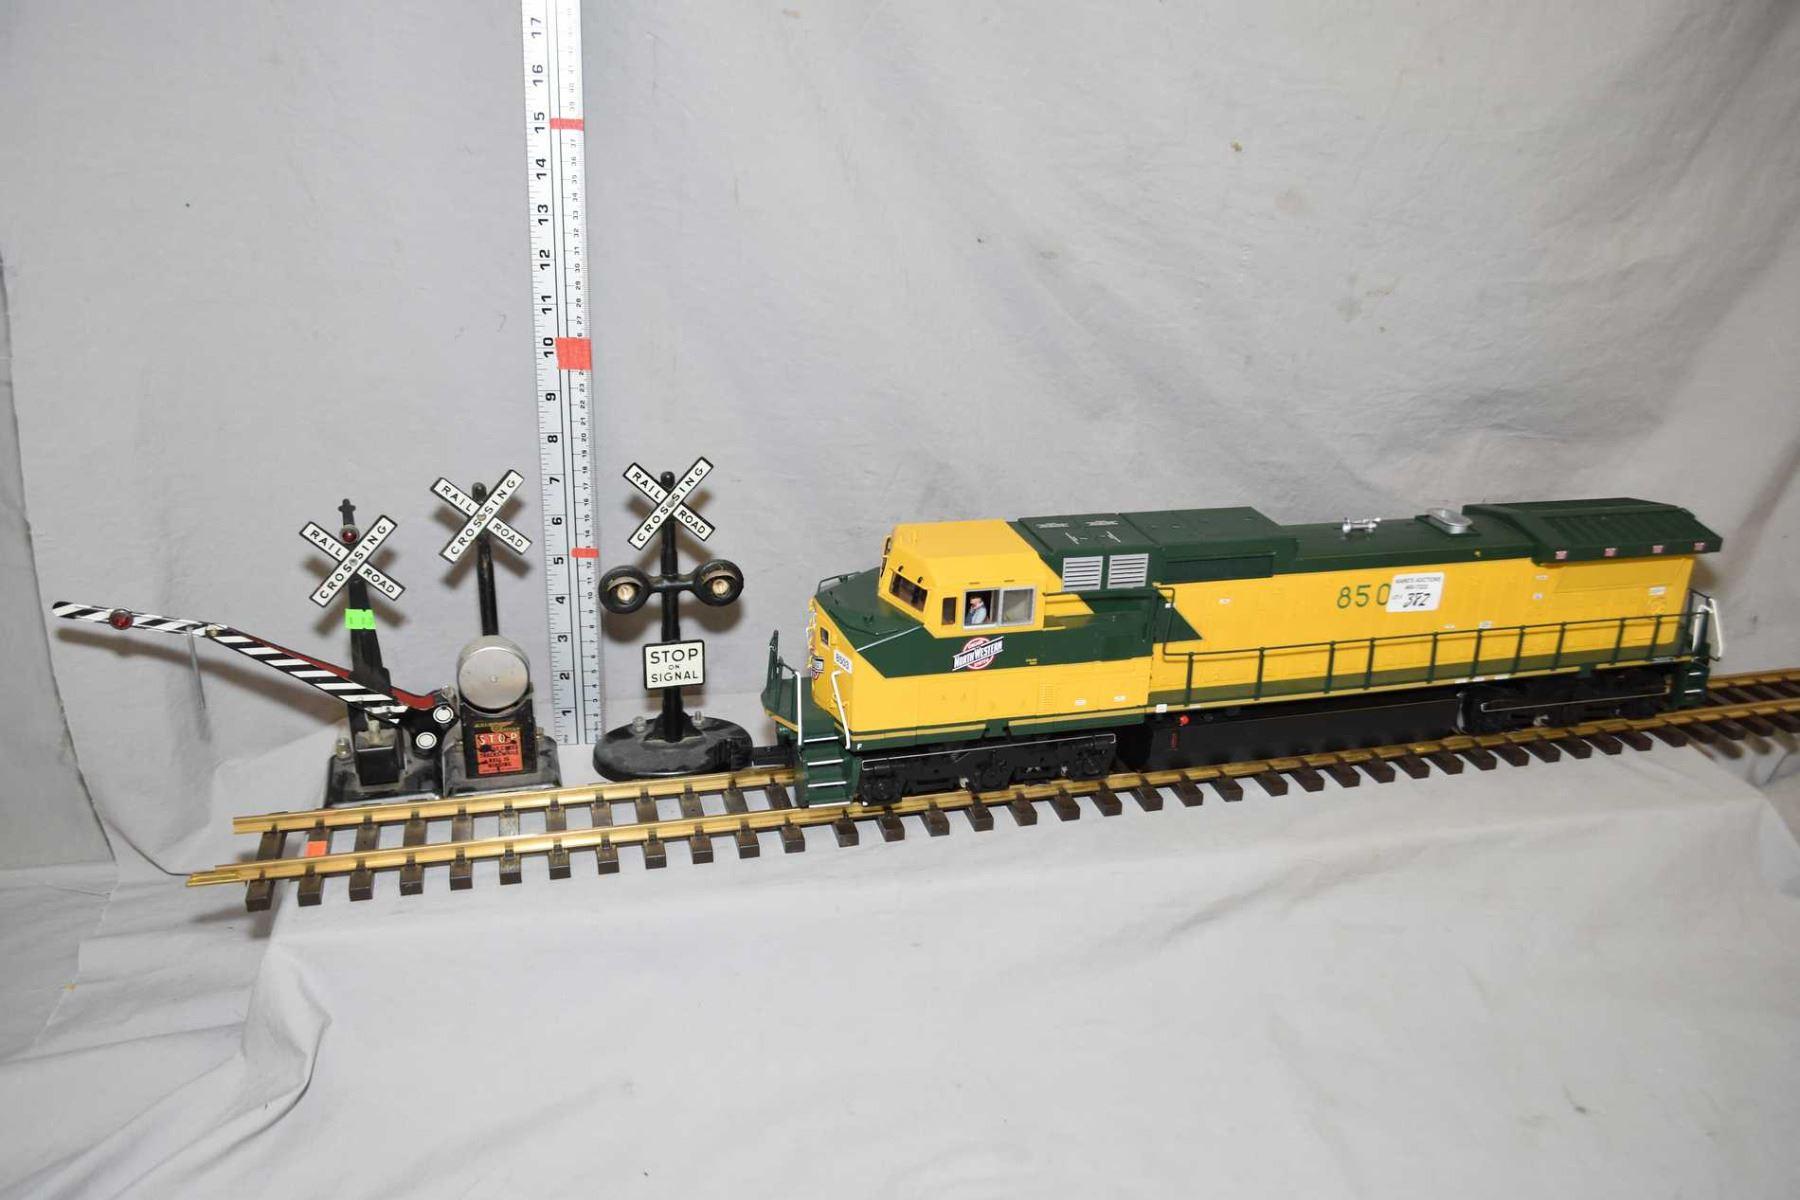 Railking One-Gauge Trains G-scale Dash 8-40CW diesel